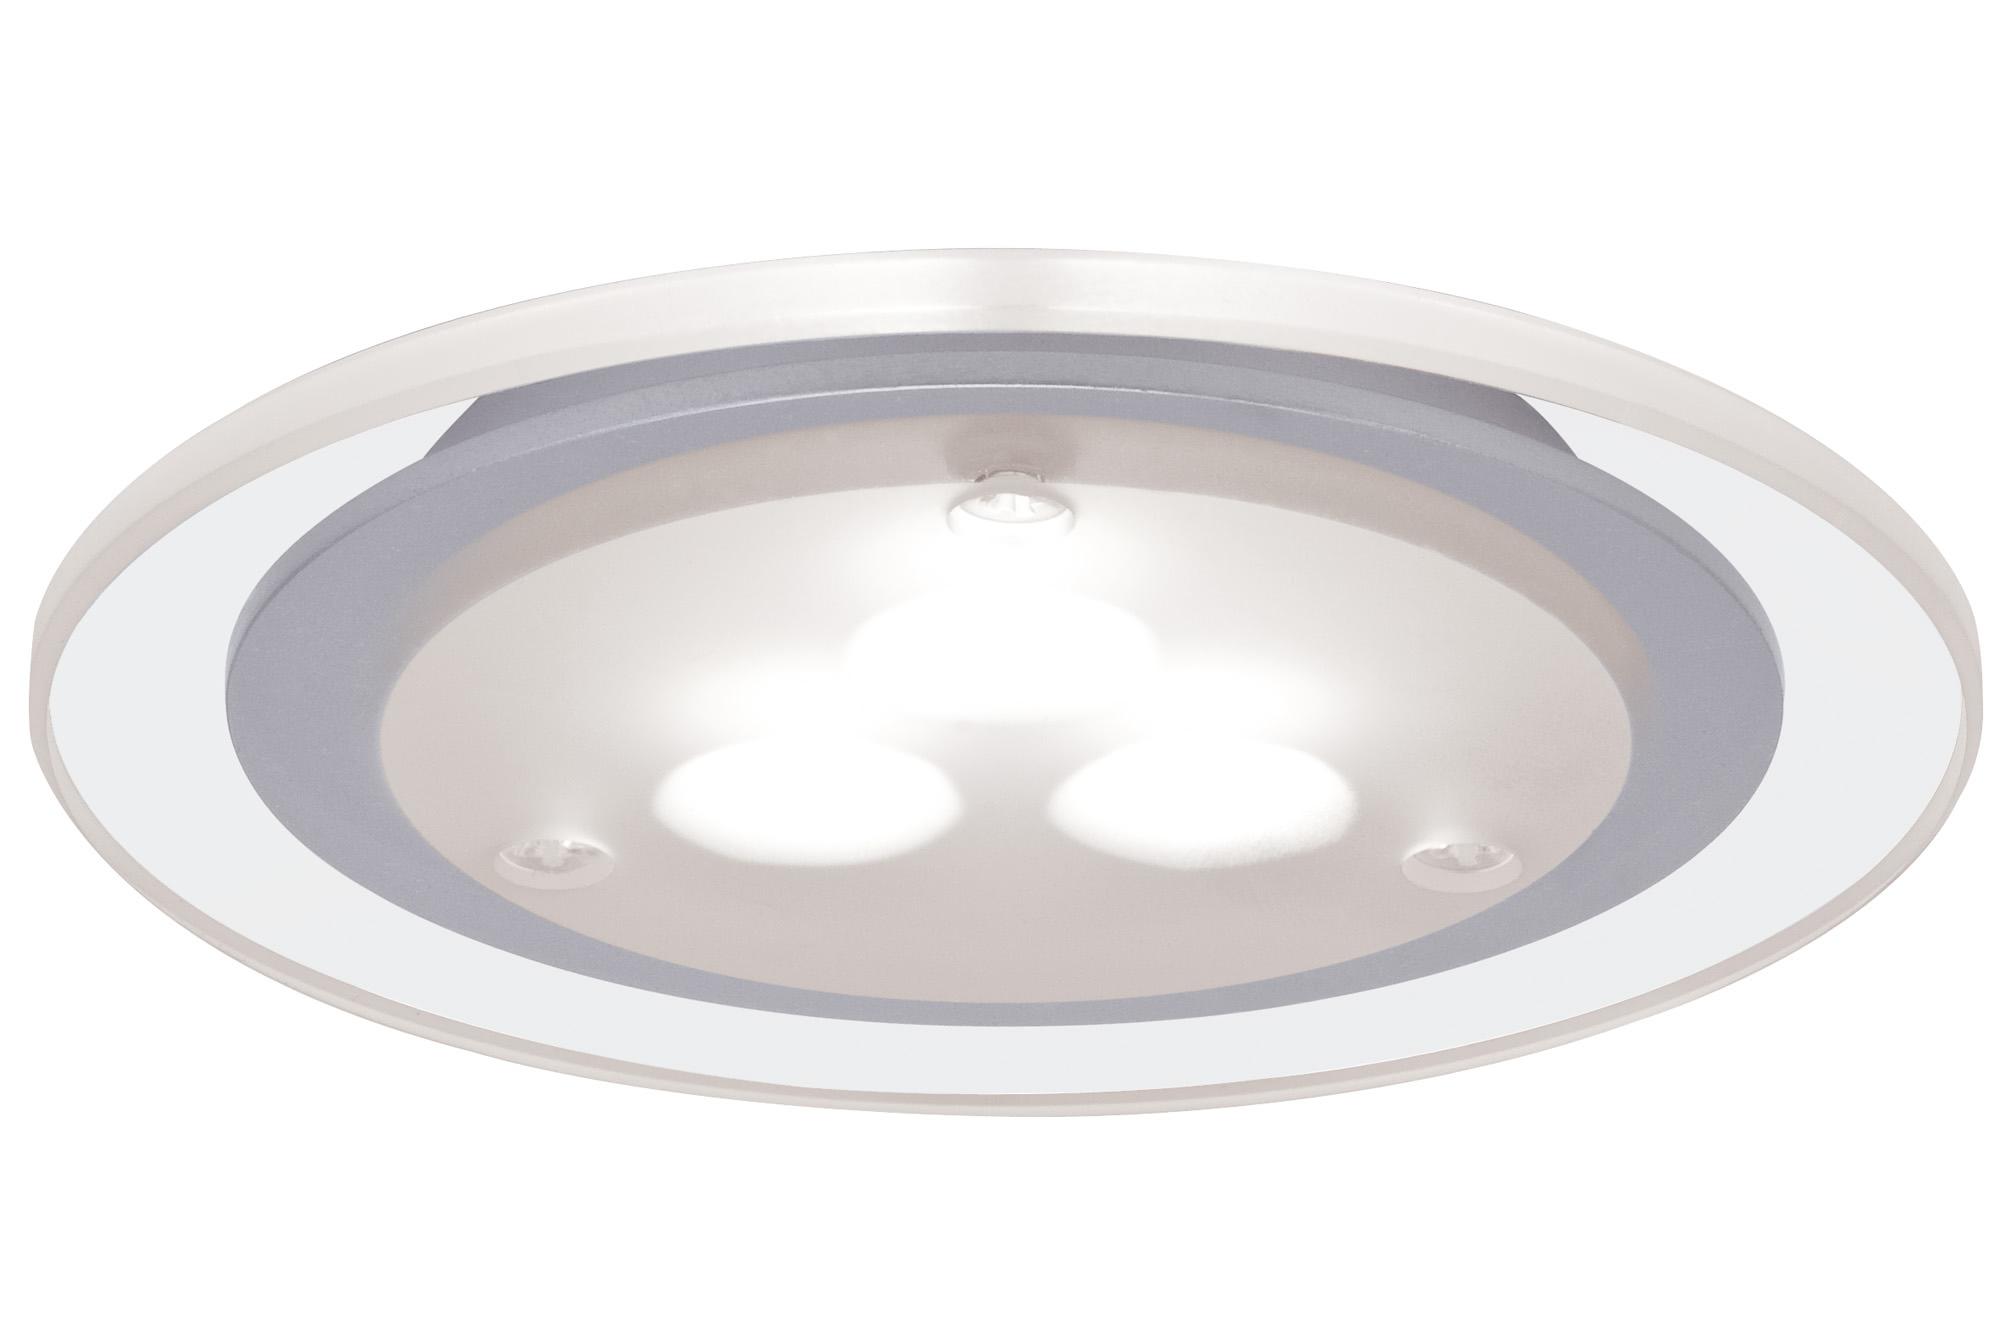 Paulmann. 93549 M?bel EBL Deco LED 1x3W 3VA Chr-m